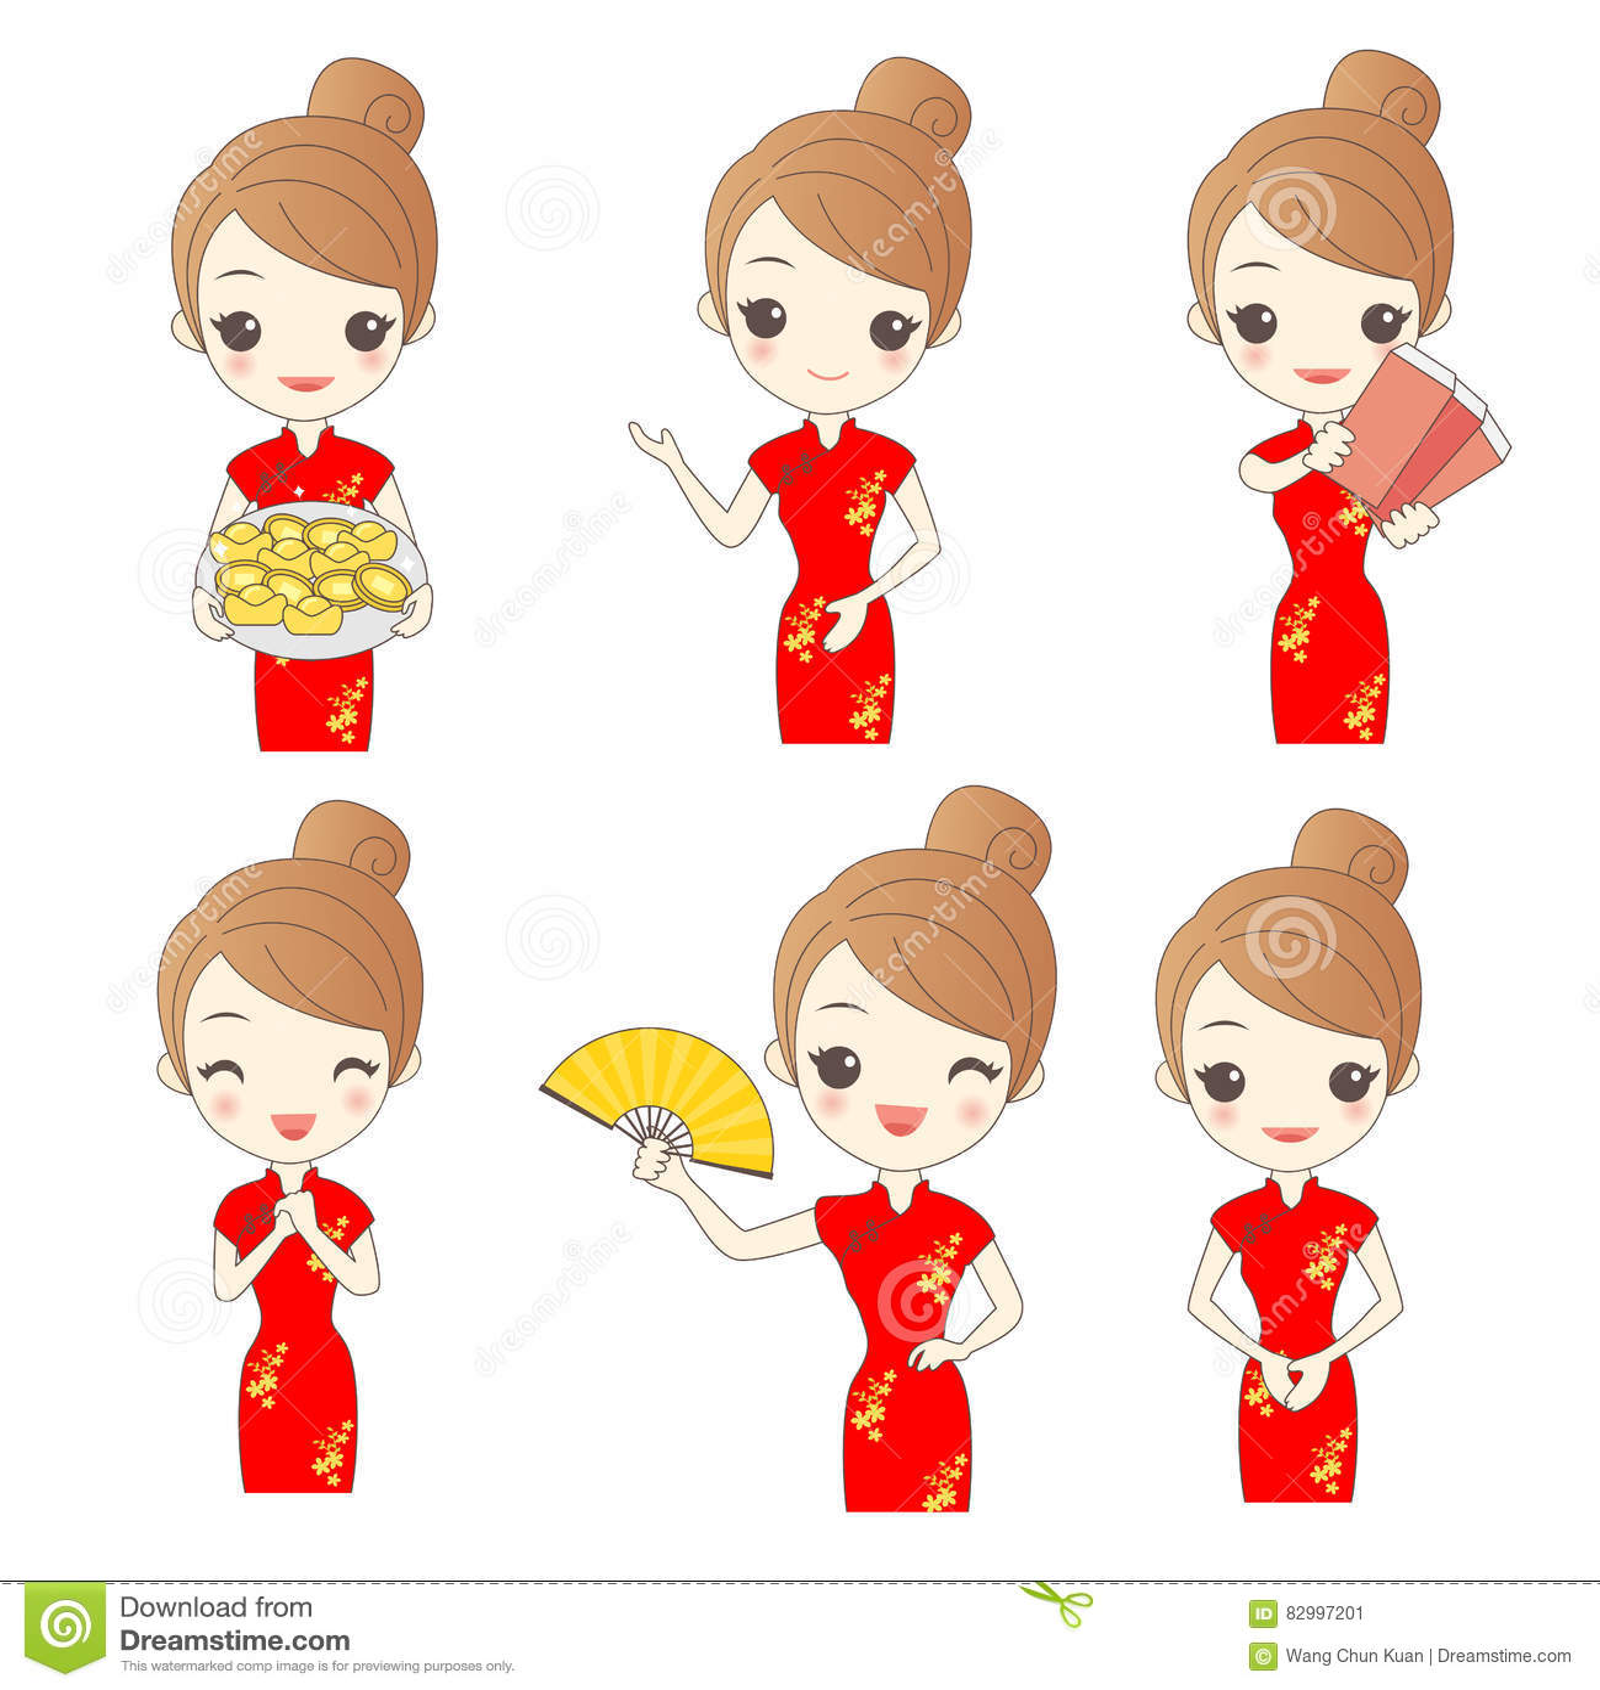 Qipao Cartoons, Illustrations & Vector Stock Images